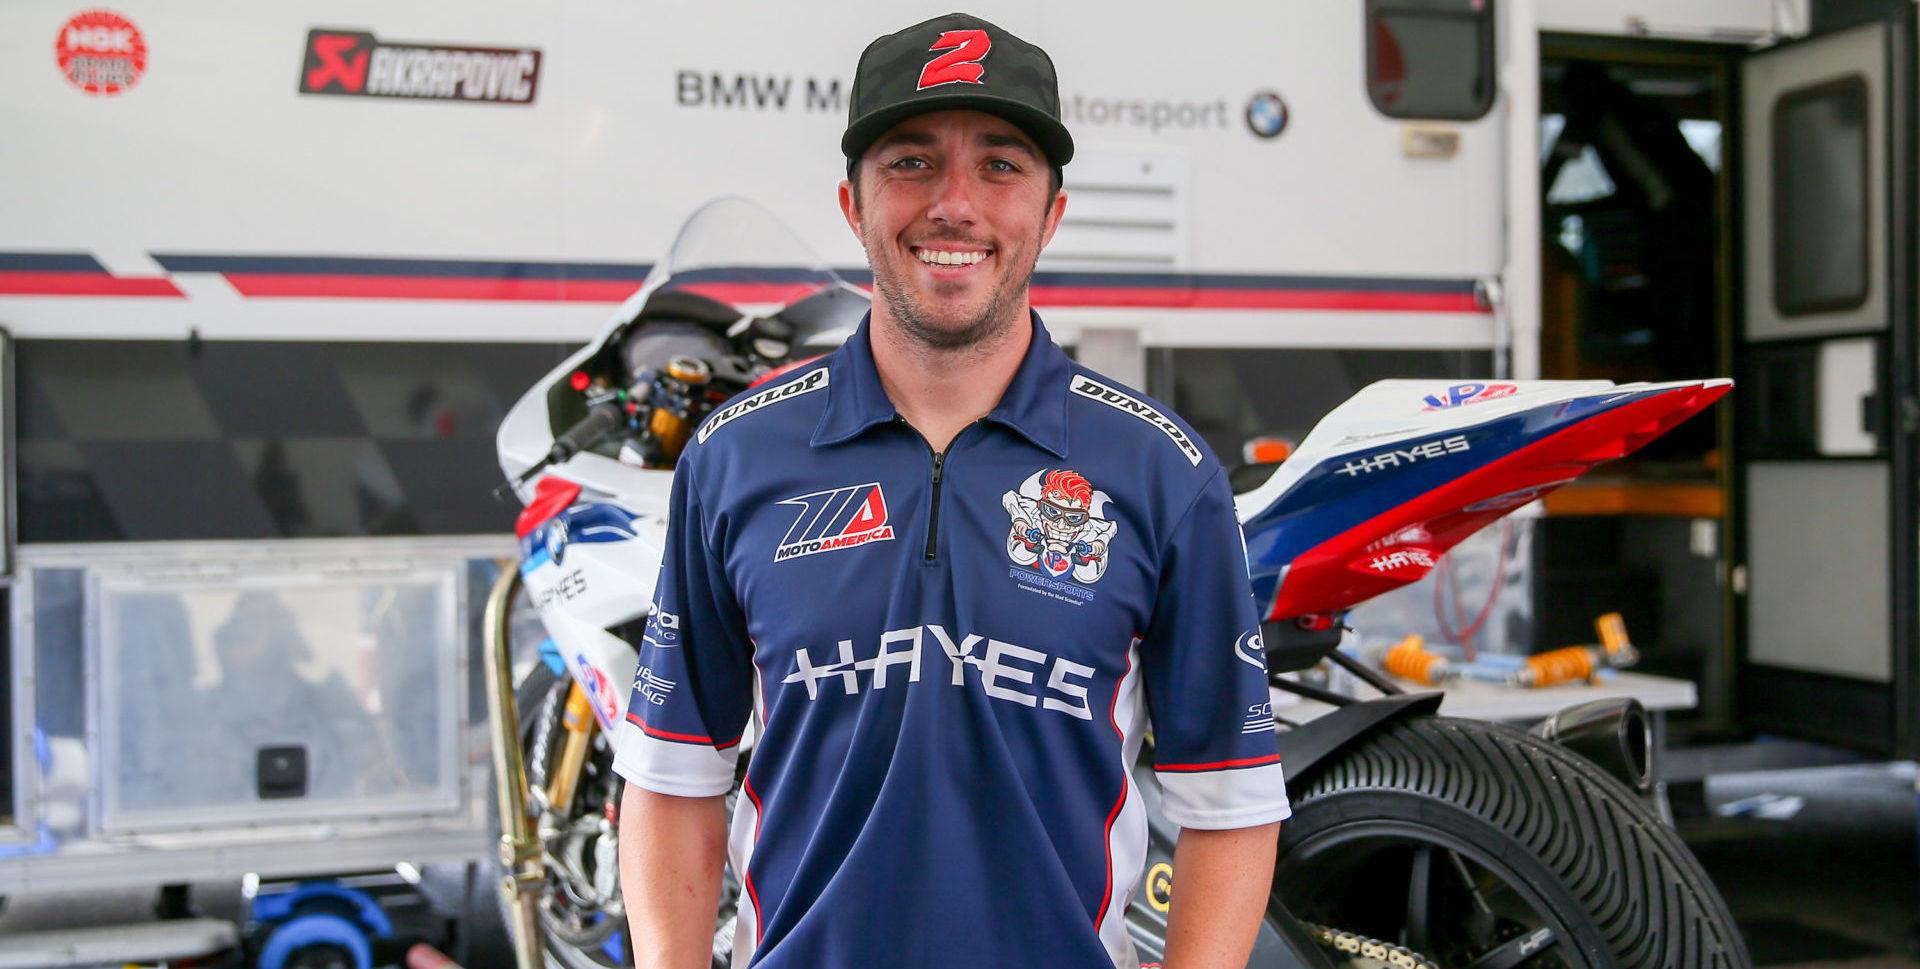 Josh Herrin. Photo by Brian J. Nelson, courtesy of Scheibe Racing.